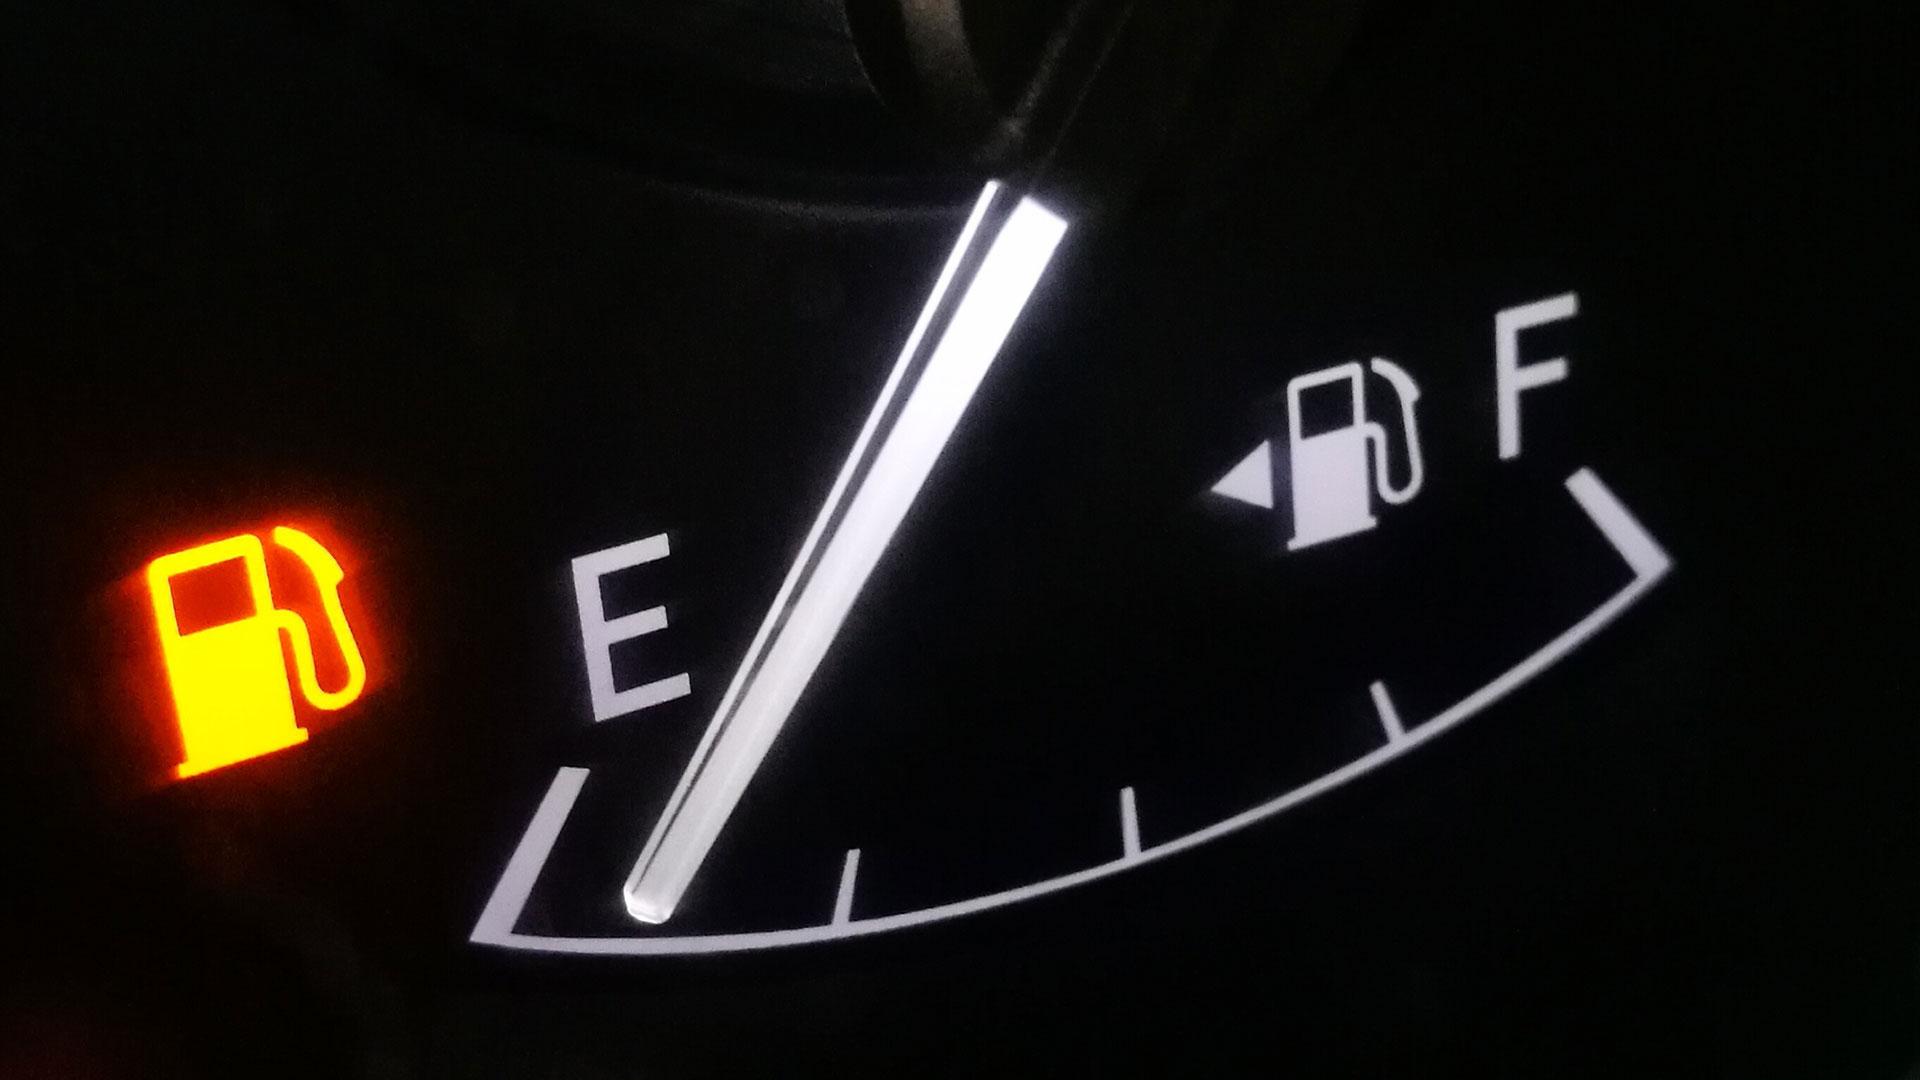 Fuel gauge arrow and light